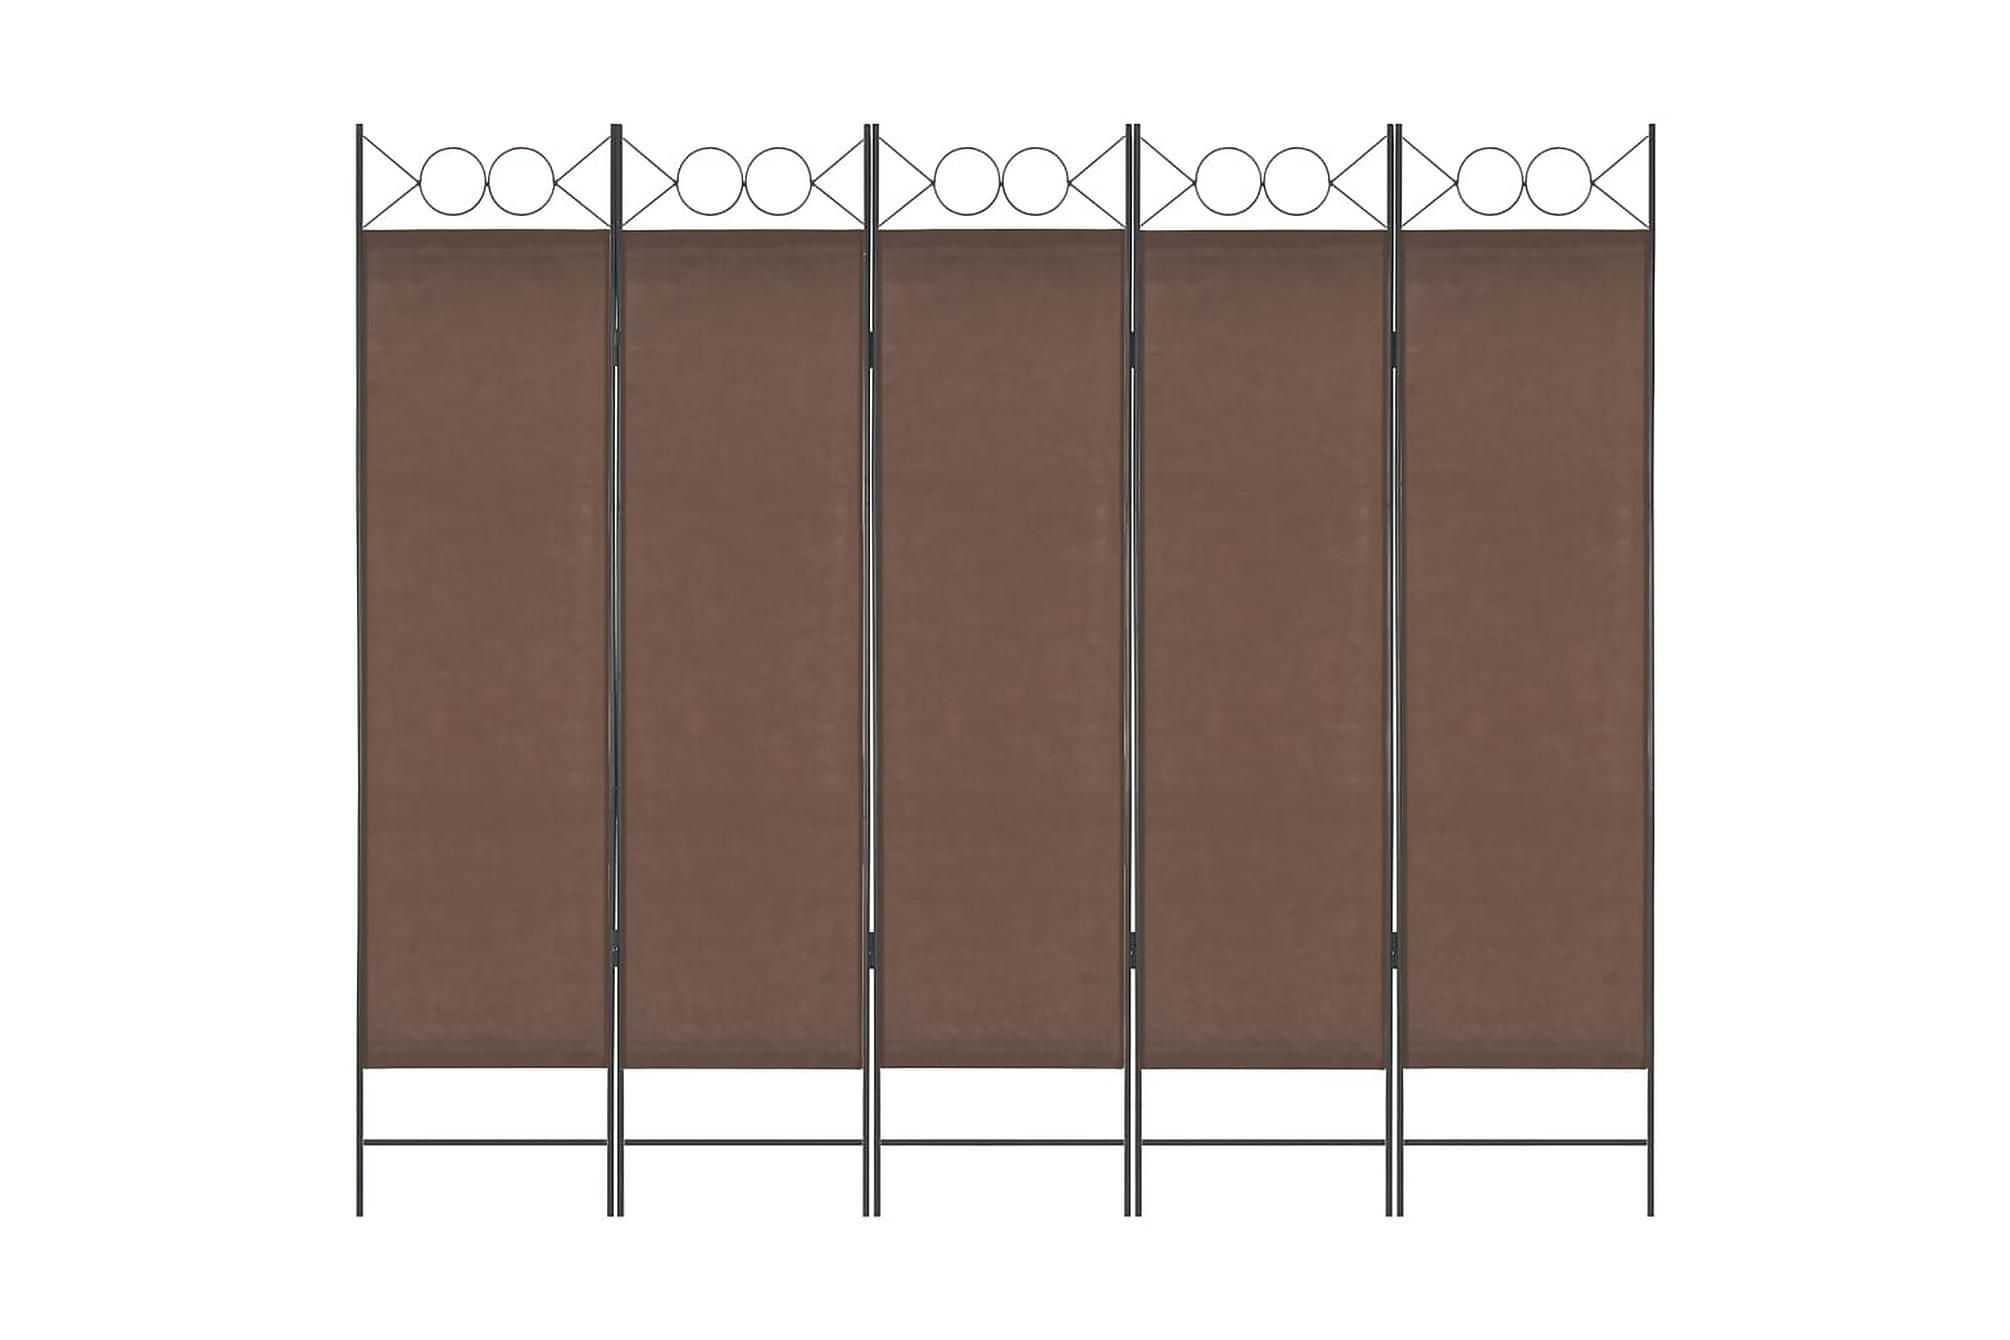 Rumsavdelare 5 paneler brun 200×180 cm